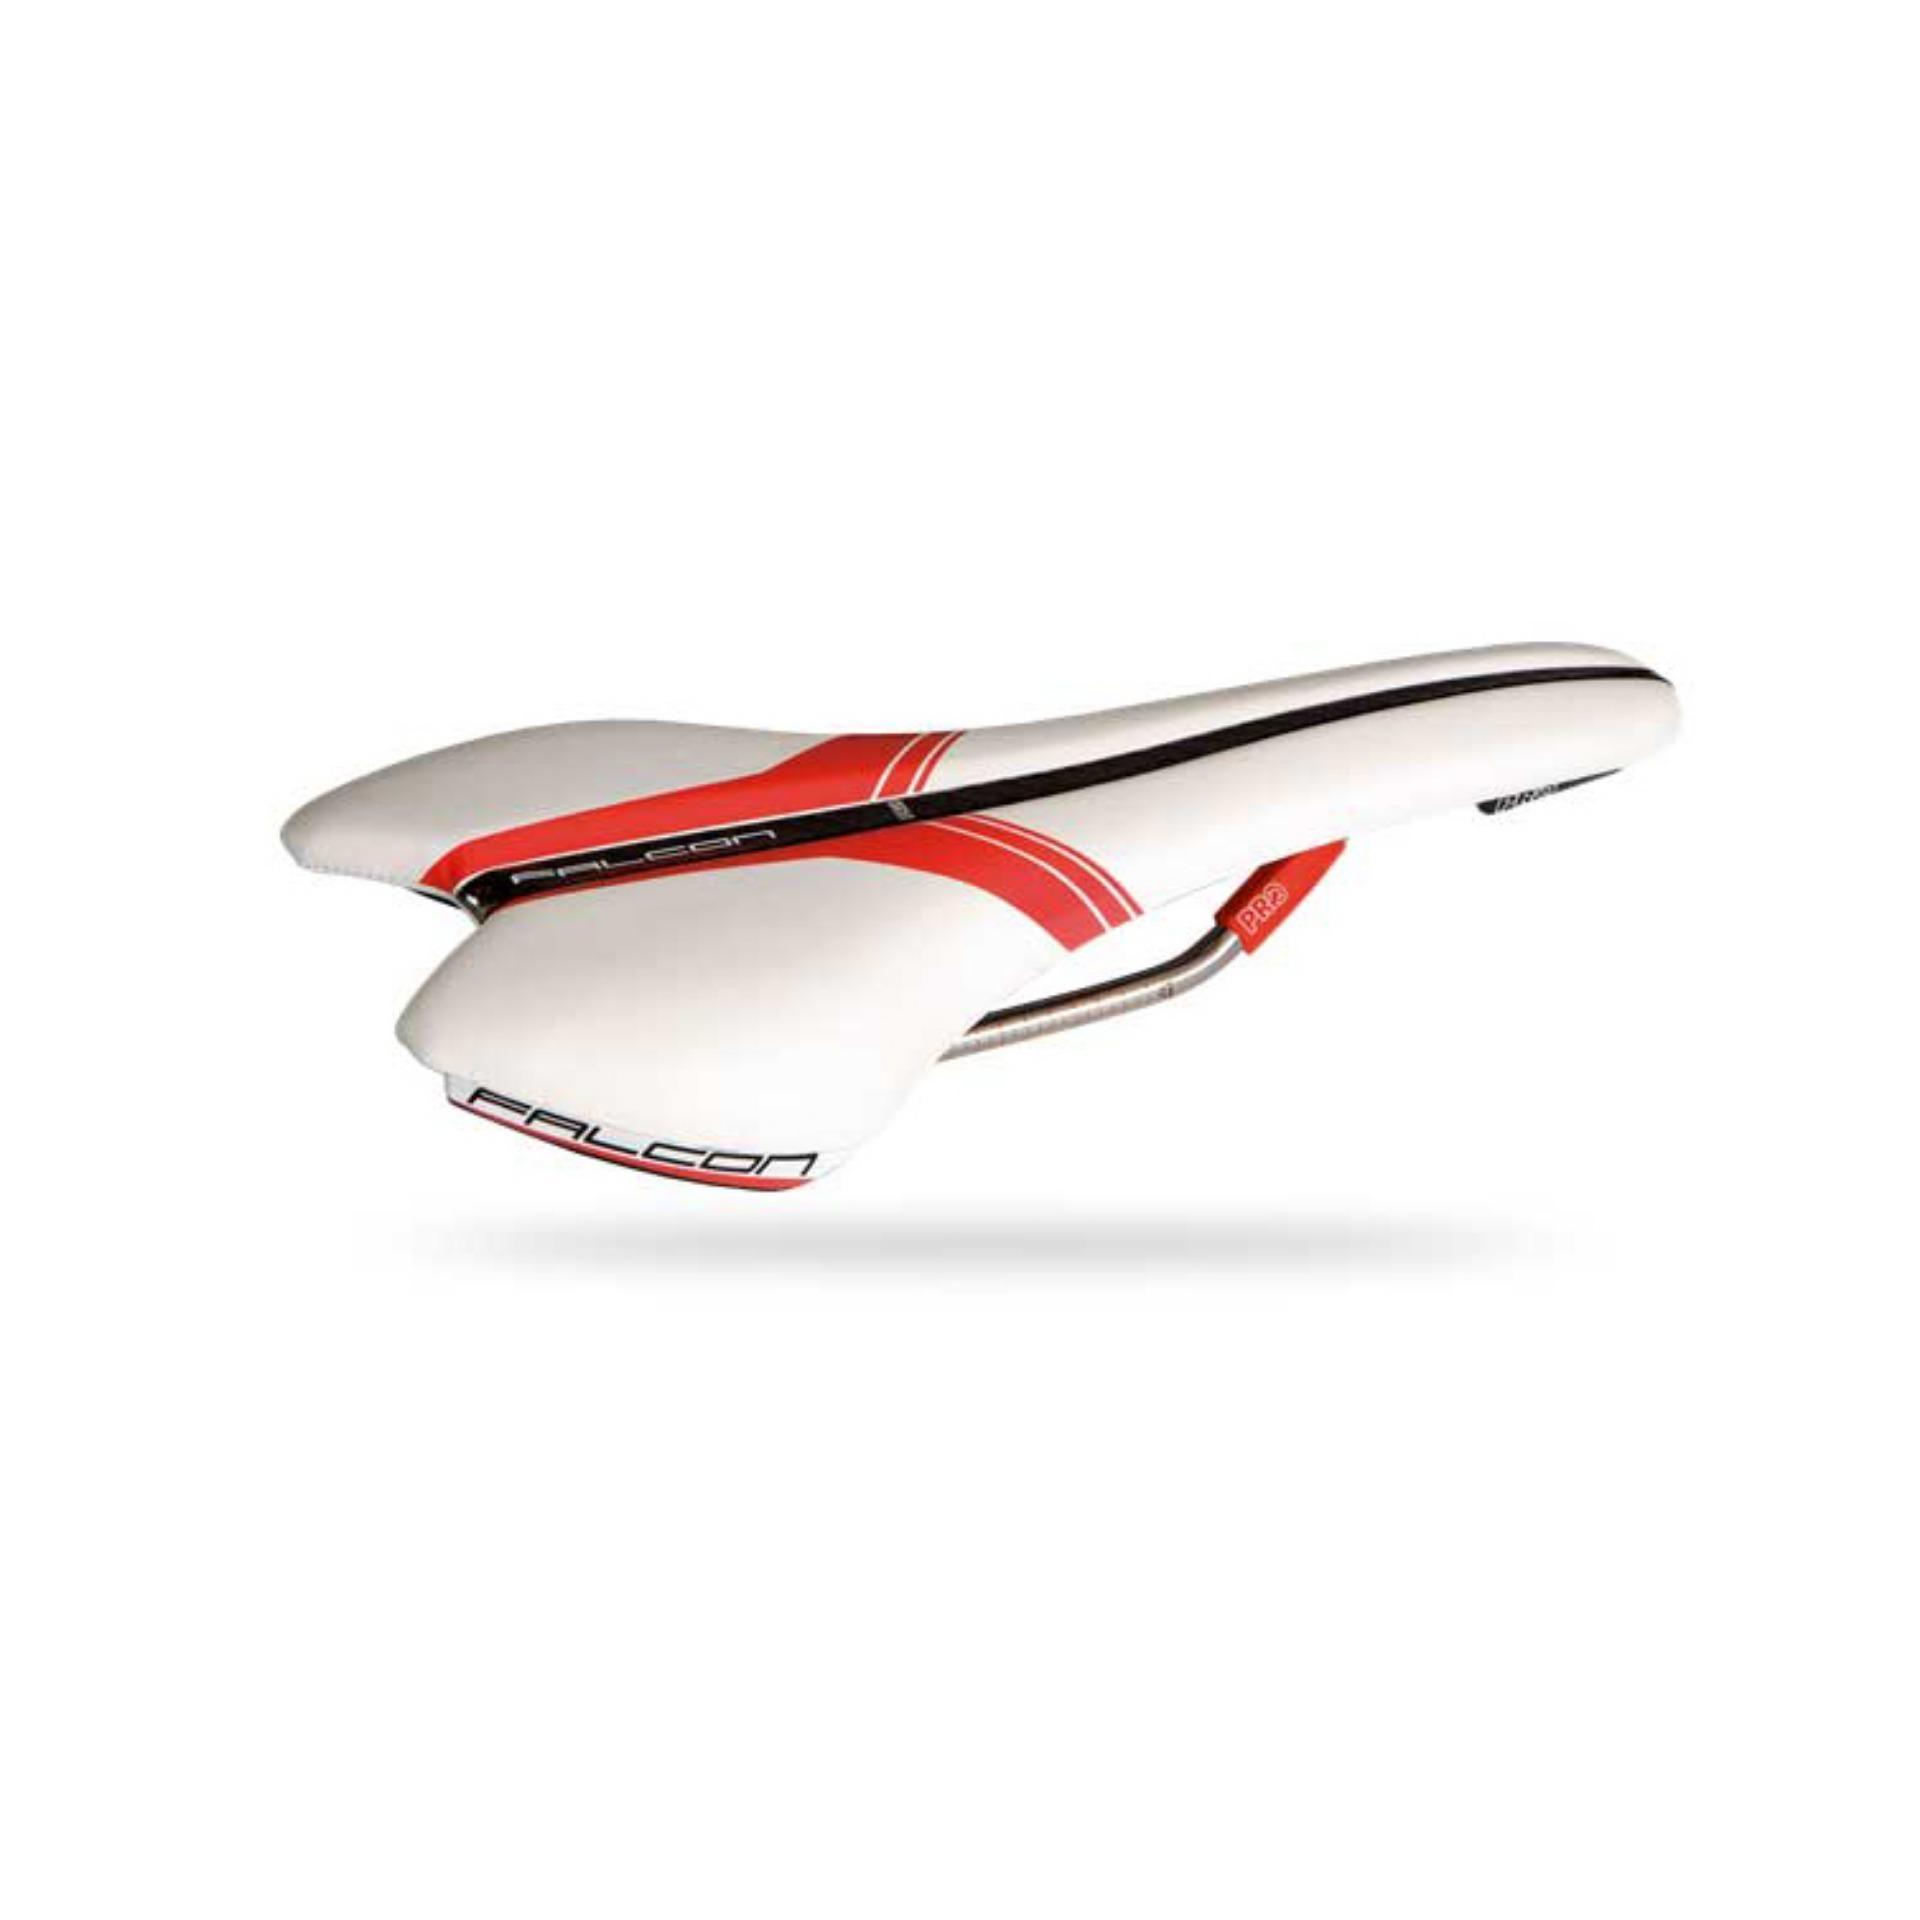 Yên xe đạp Shimano Pro Falcon TI (trắng)